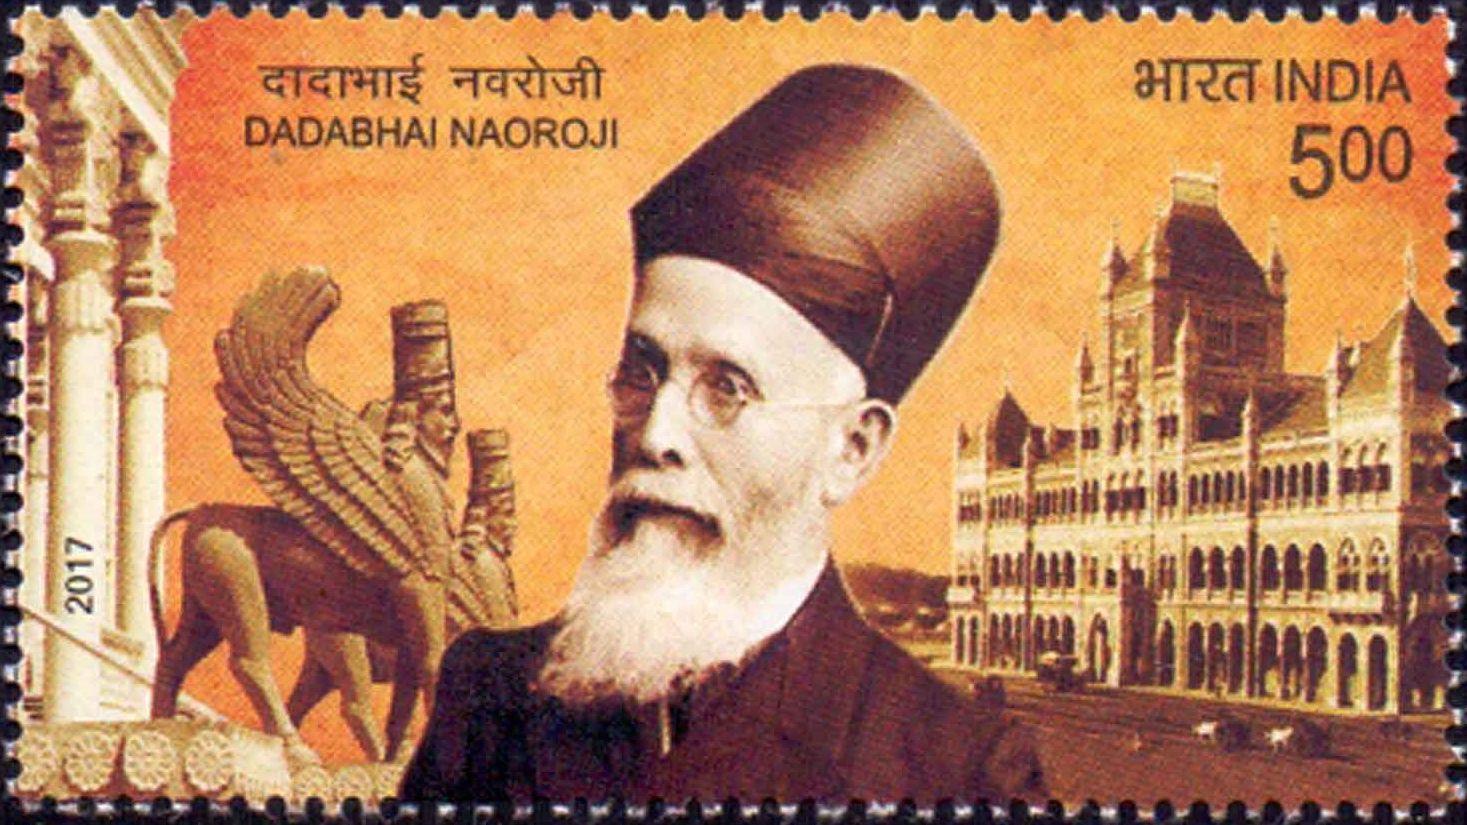 Dadabhai_Naoroji_2017_stamp_of_India